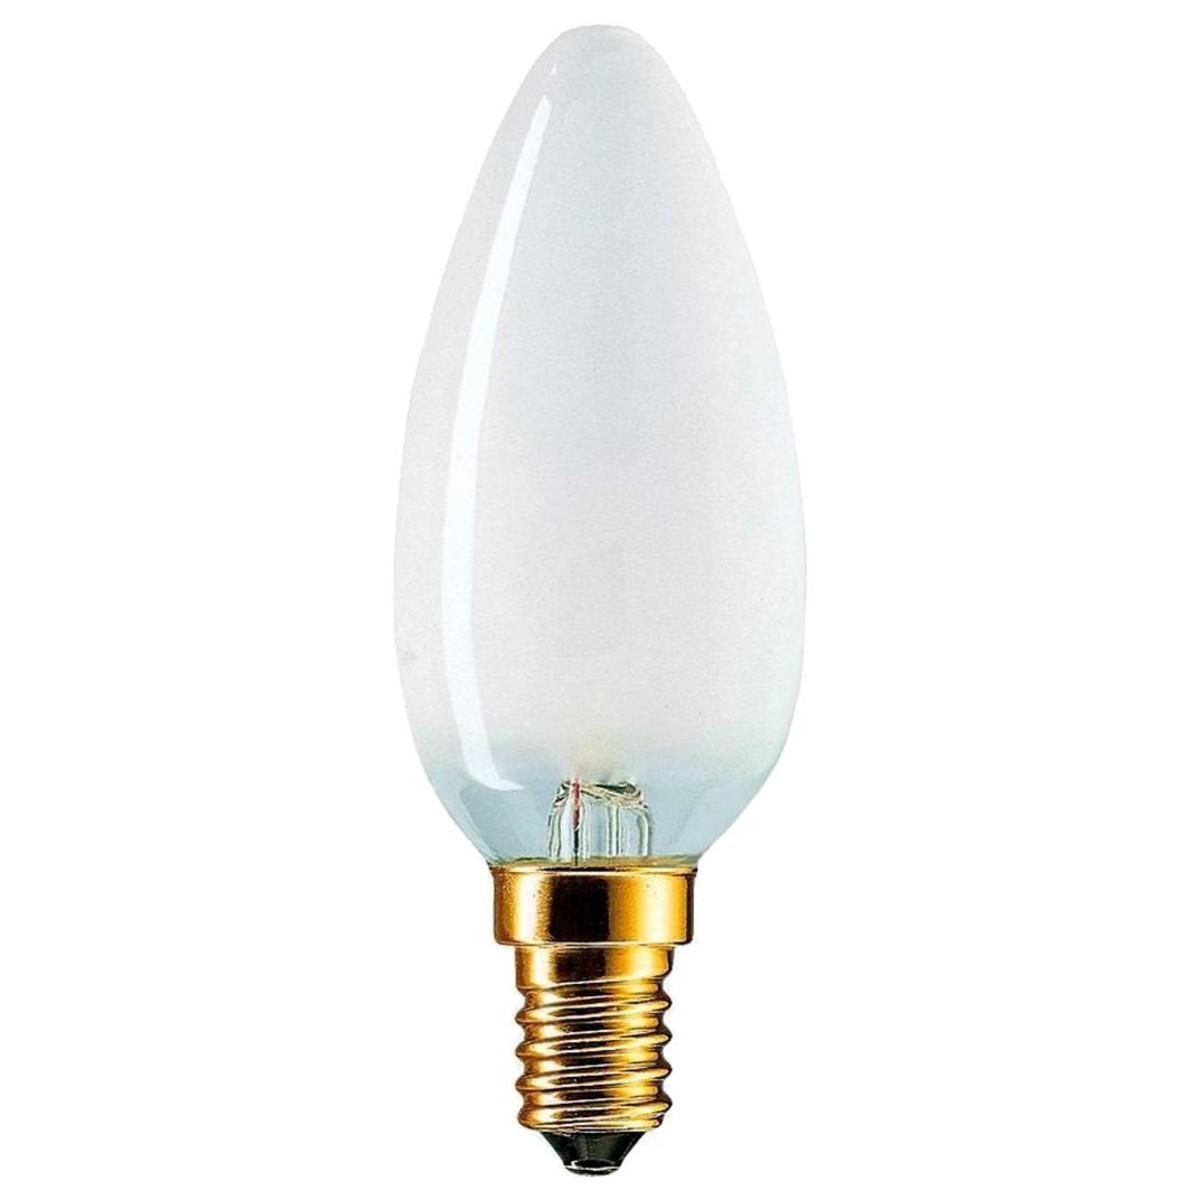 Лампа накаливания Philips C0018396 E14 390 Лм теплый свет